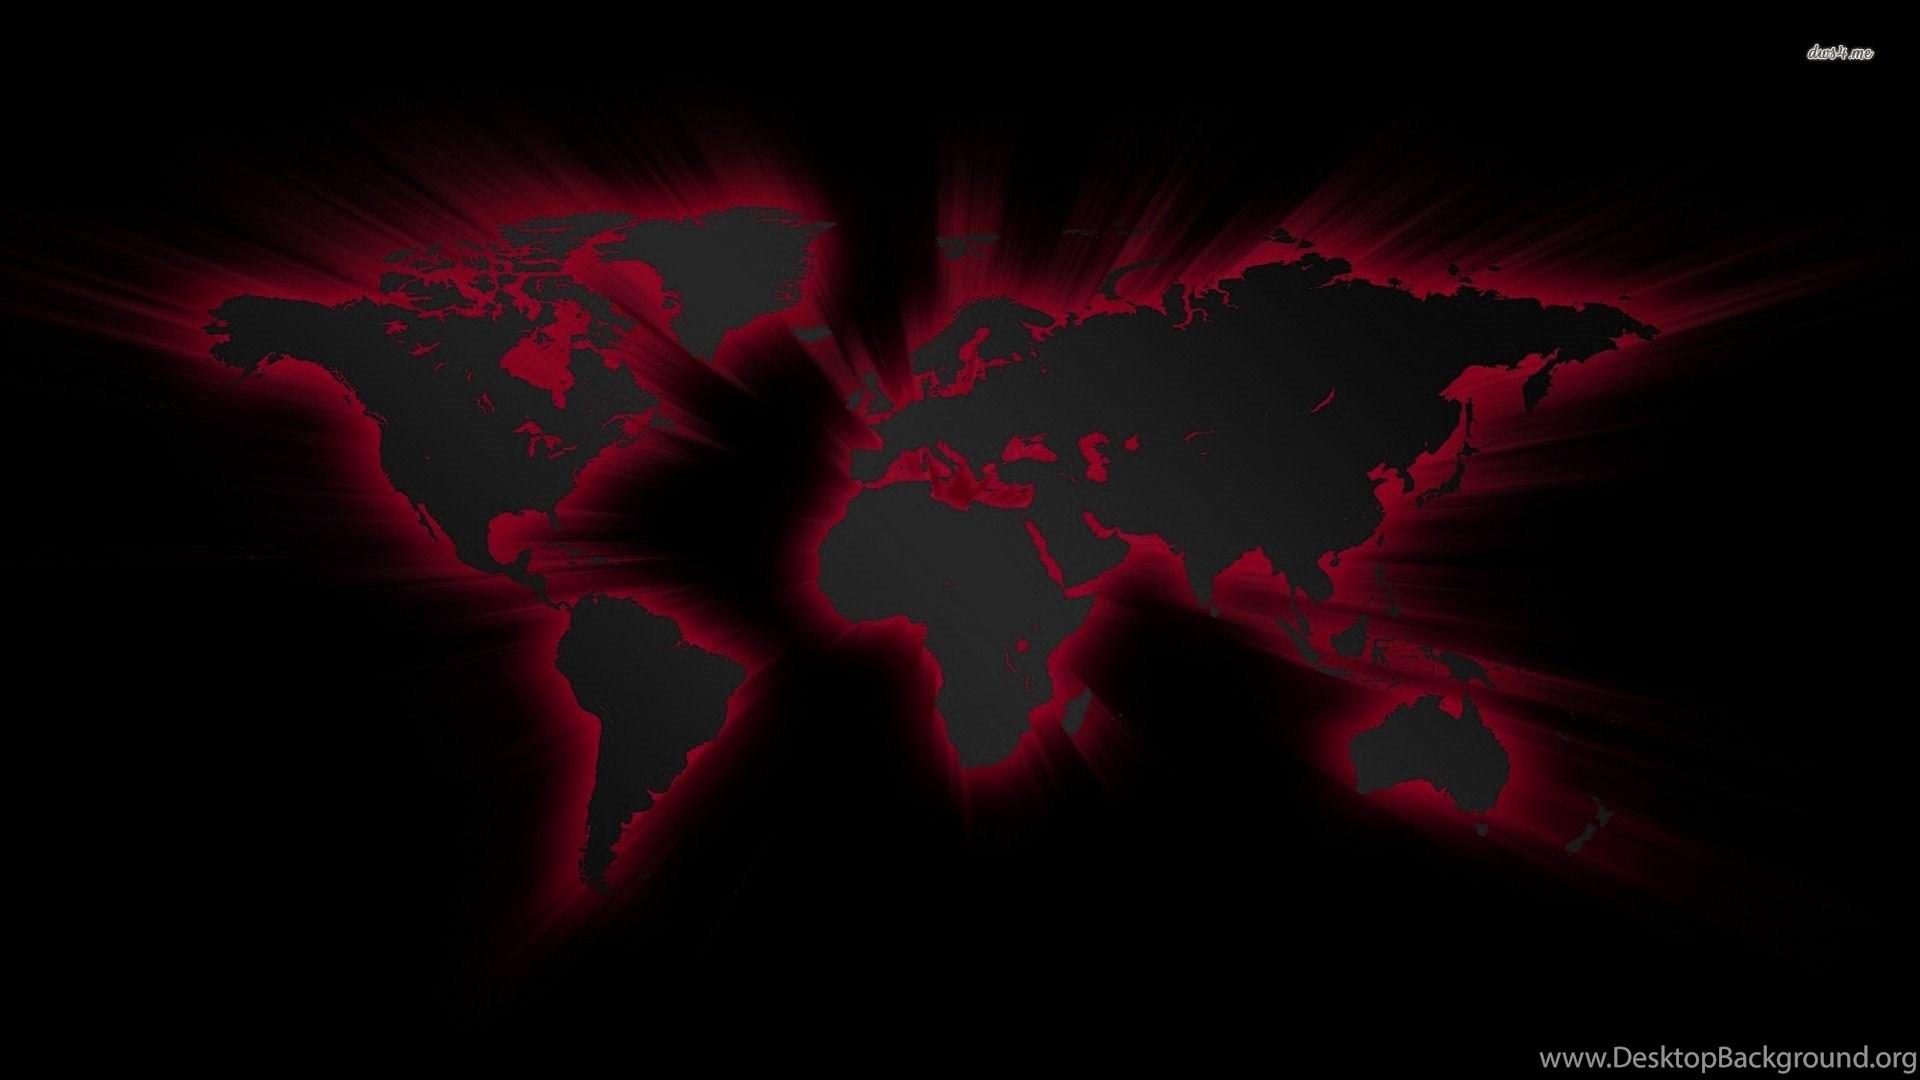 Black world map wallpapers digital art wallpapers desktop background popular gumiabroncs Image collections